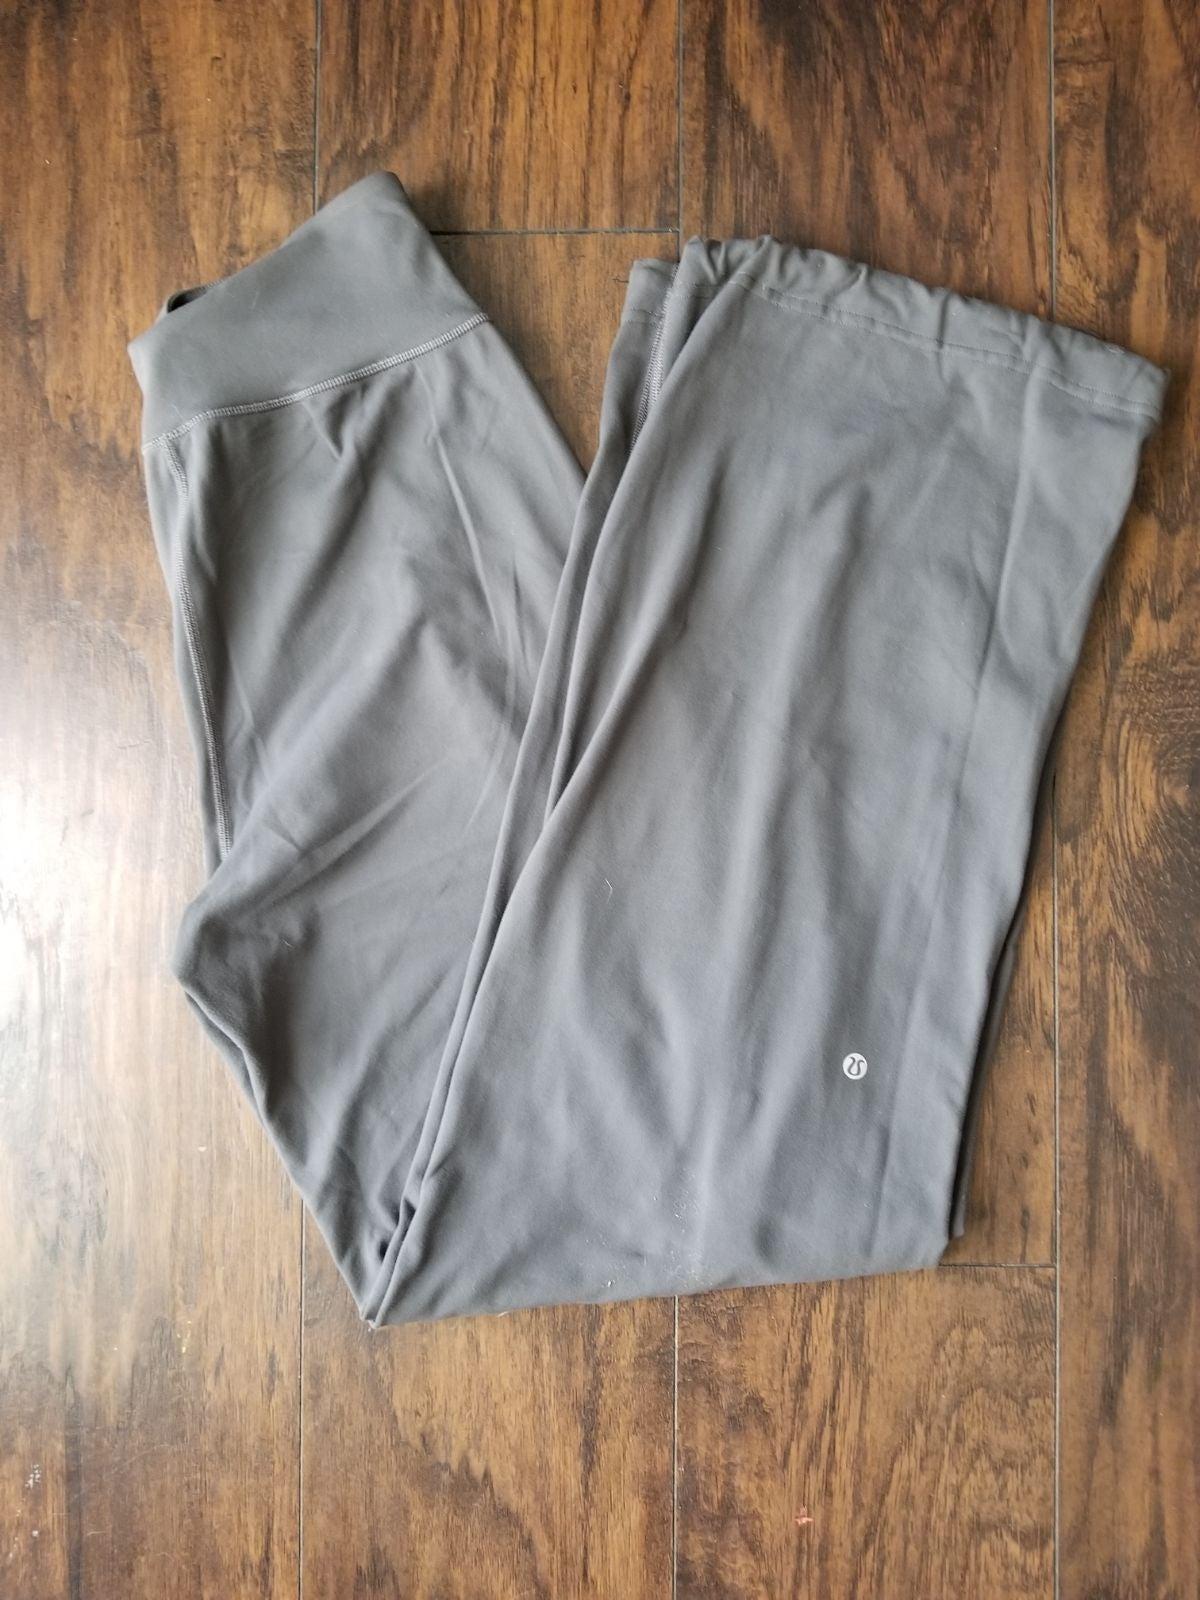 Lululemon wide leg draw string pants